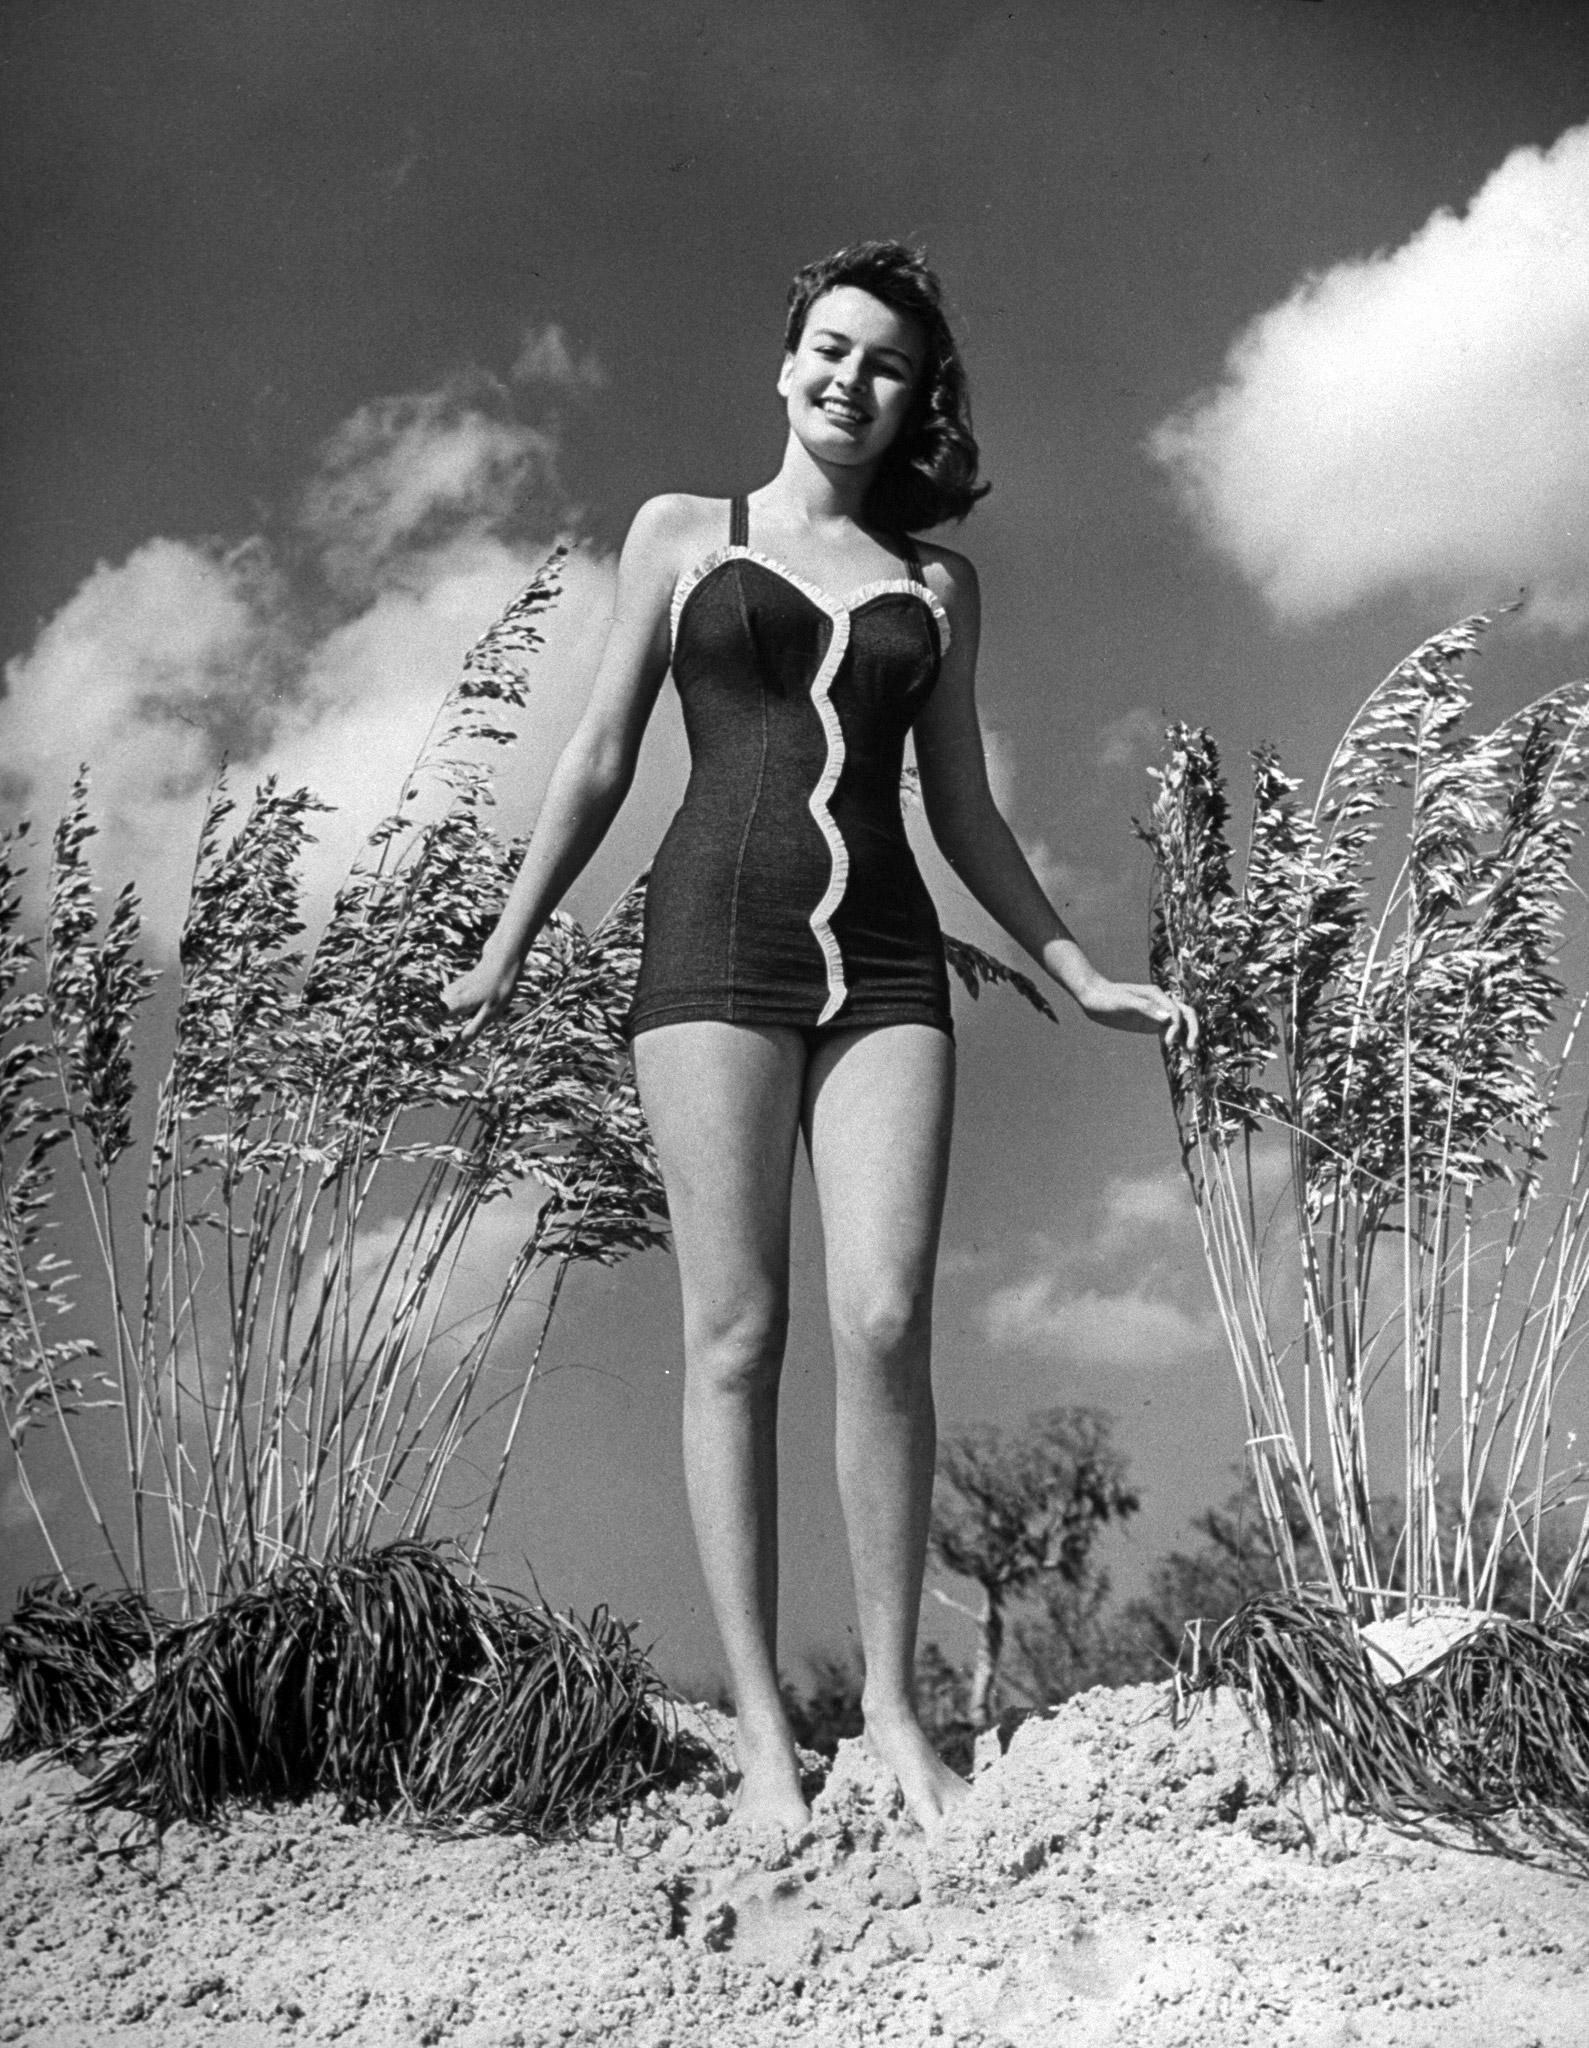 Model posing in bathing suit in Florida, circa 1945.